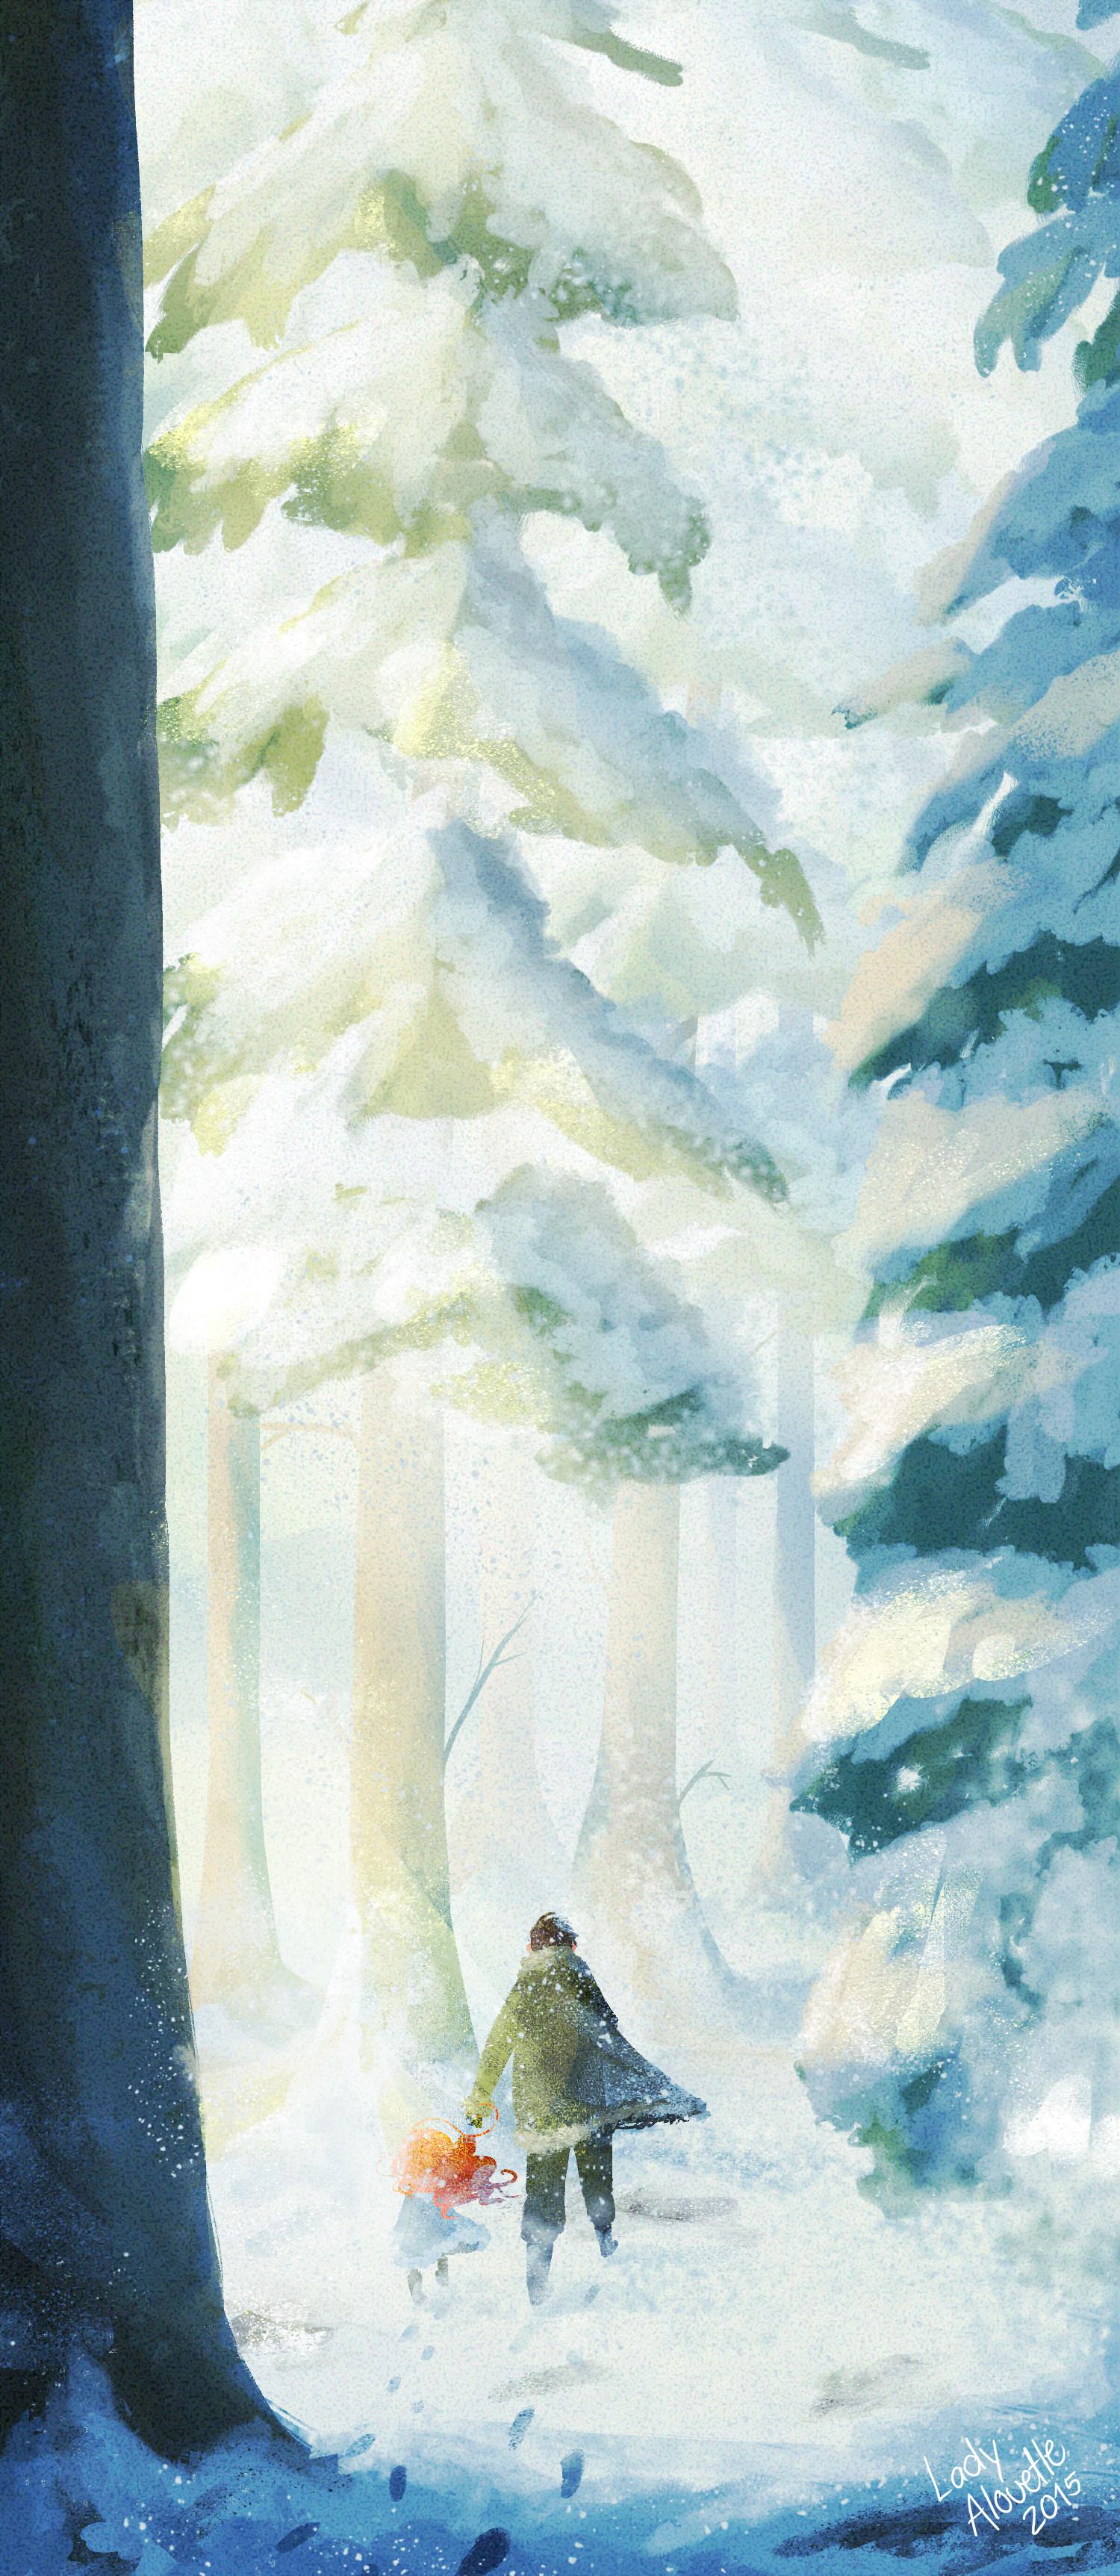 Fatima anaya winter16